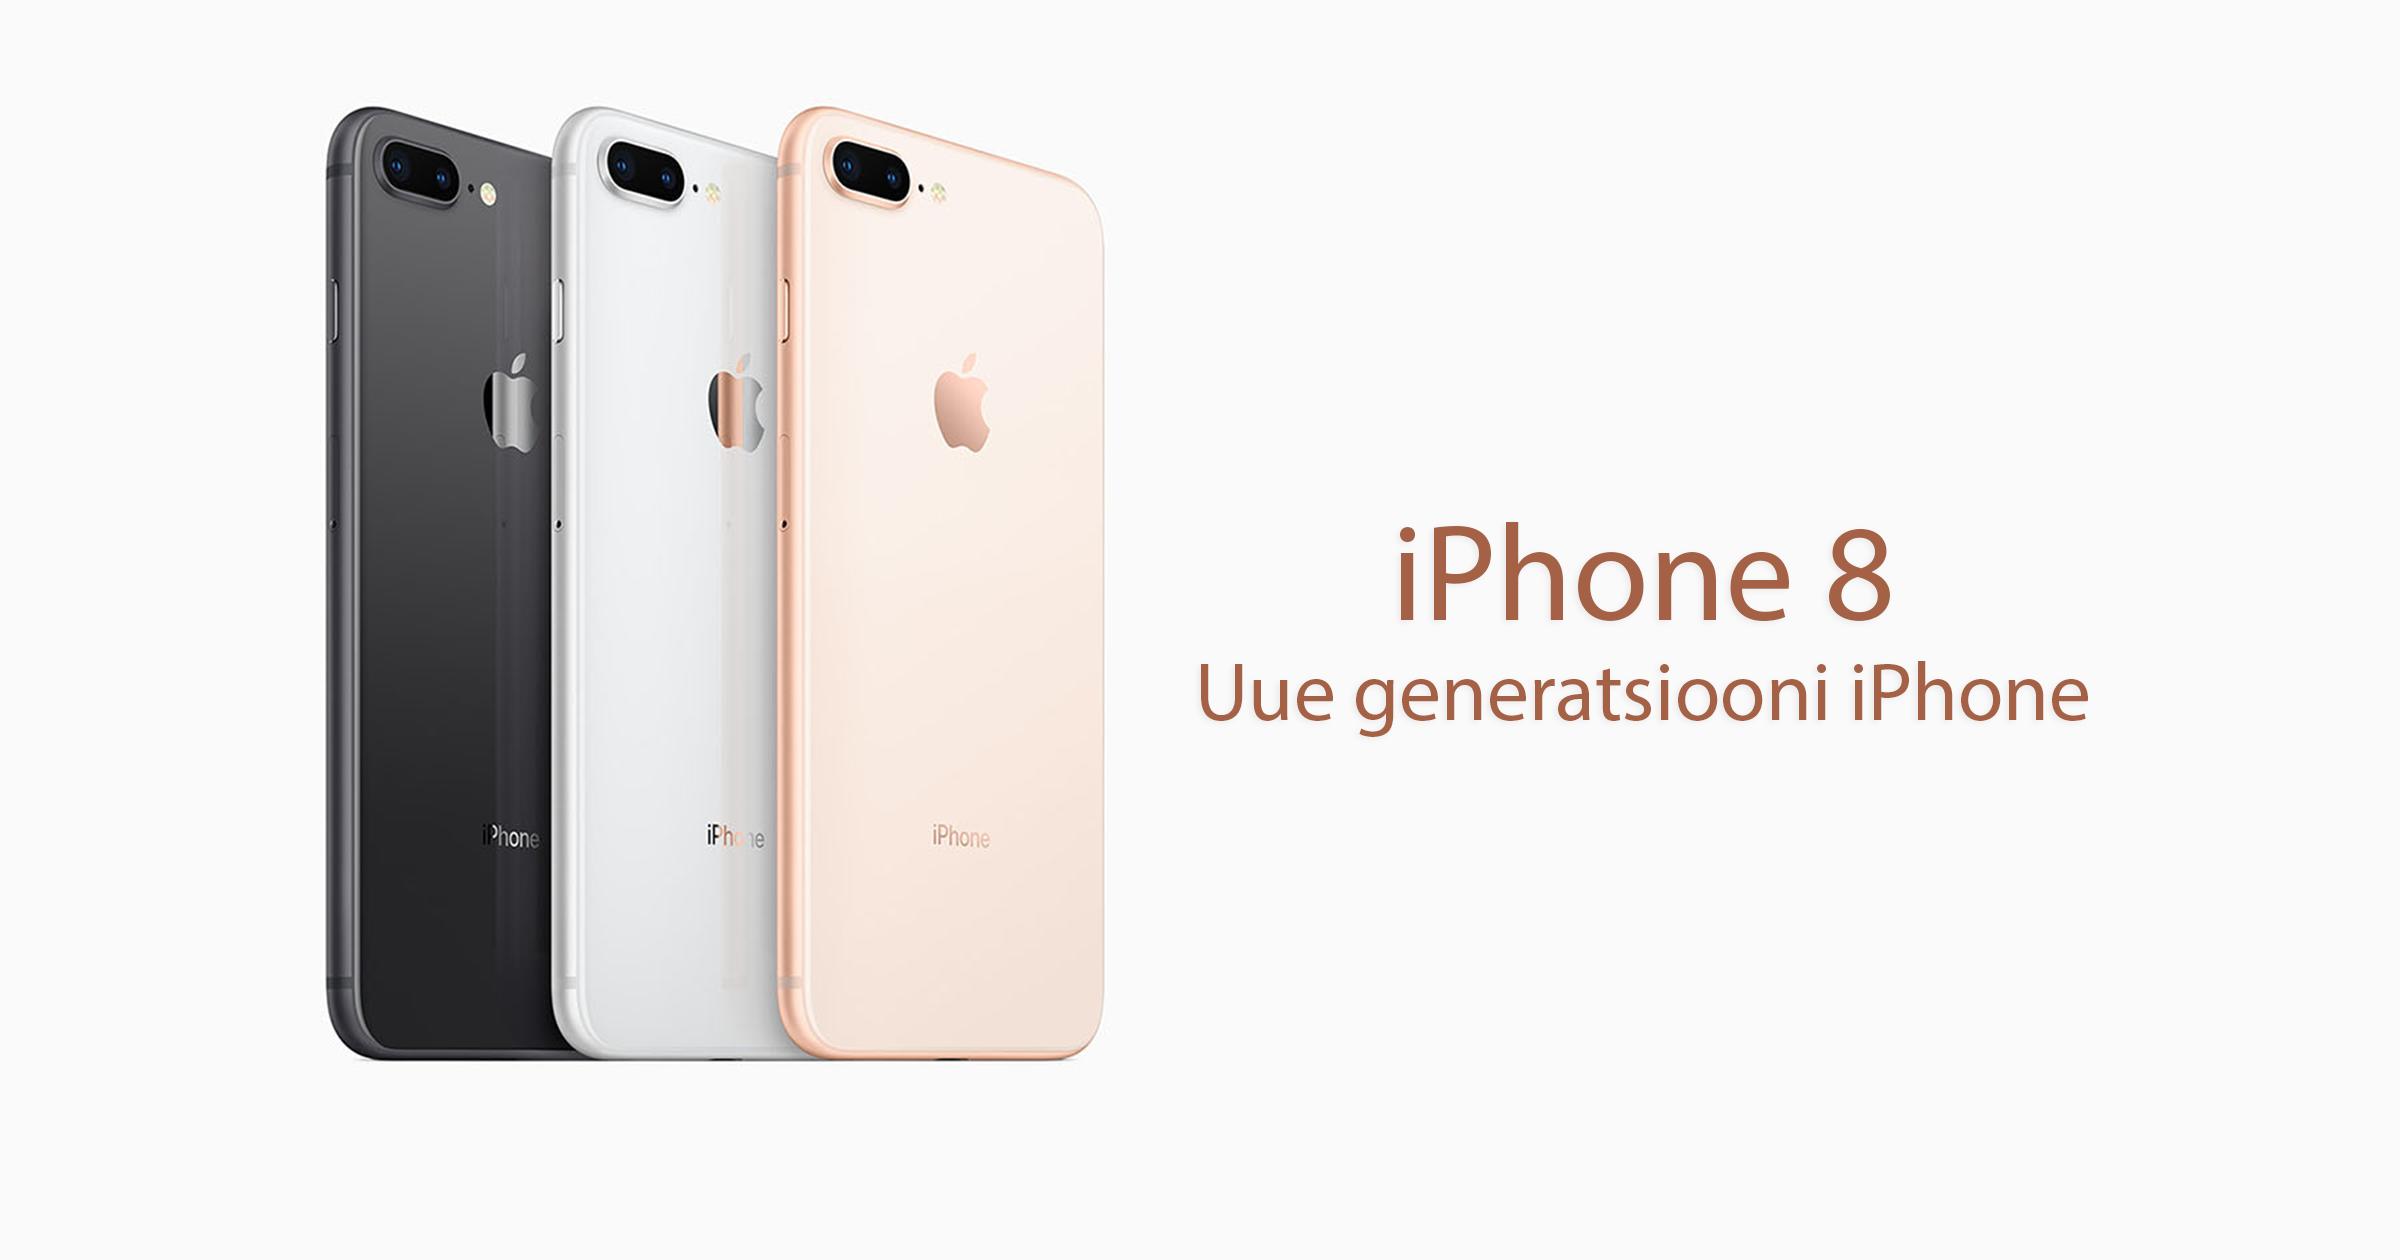 iphone 8 iphone 8 plus new iphone uus iphone new generation iphone apple mobipunkt ipad wacth  macbook  iphone 8 hind iphone 8 müük